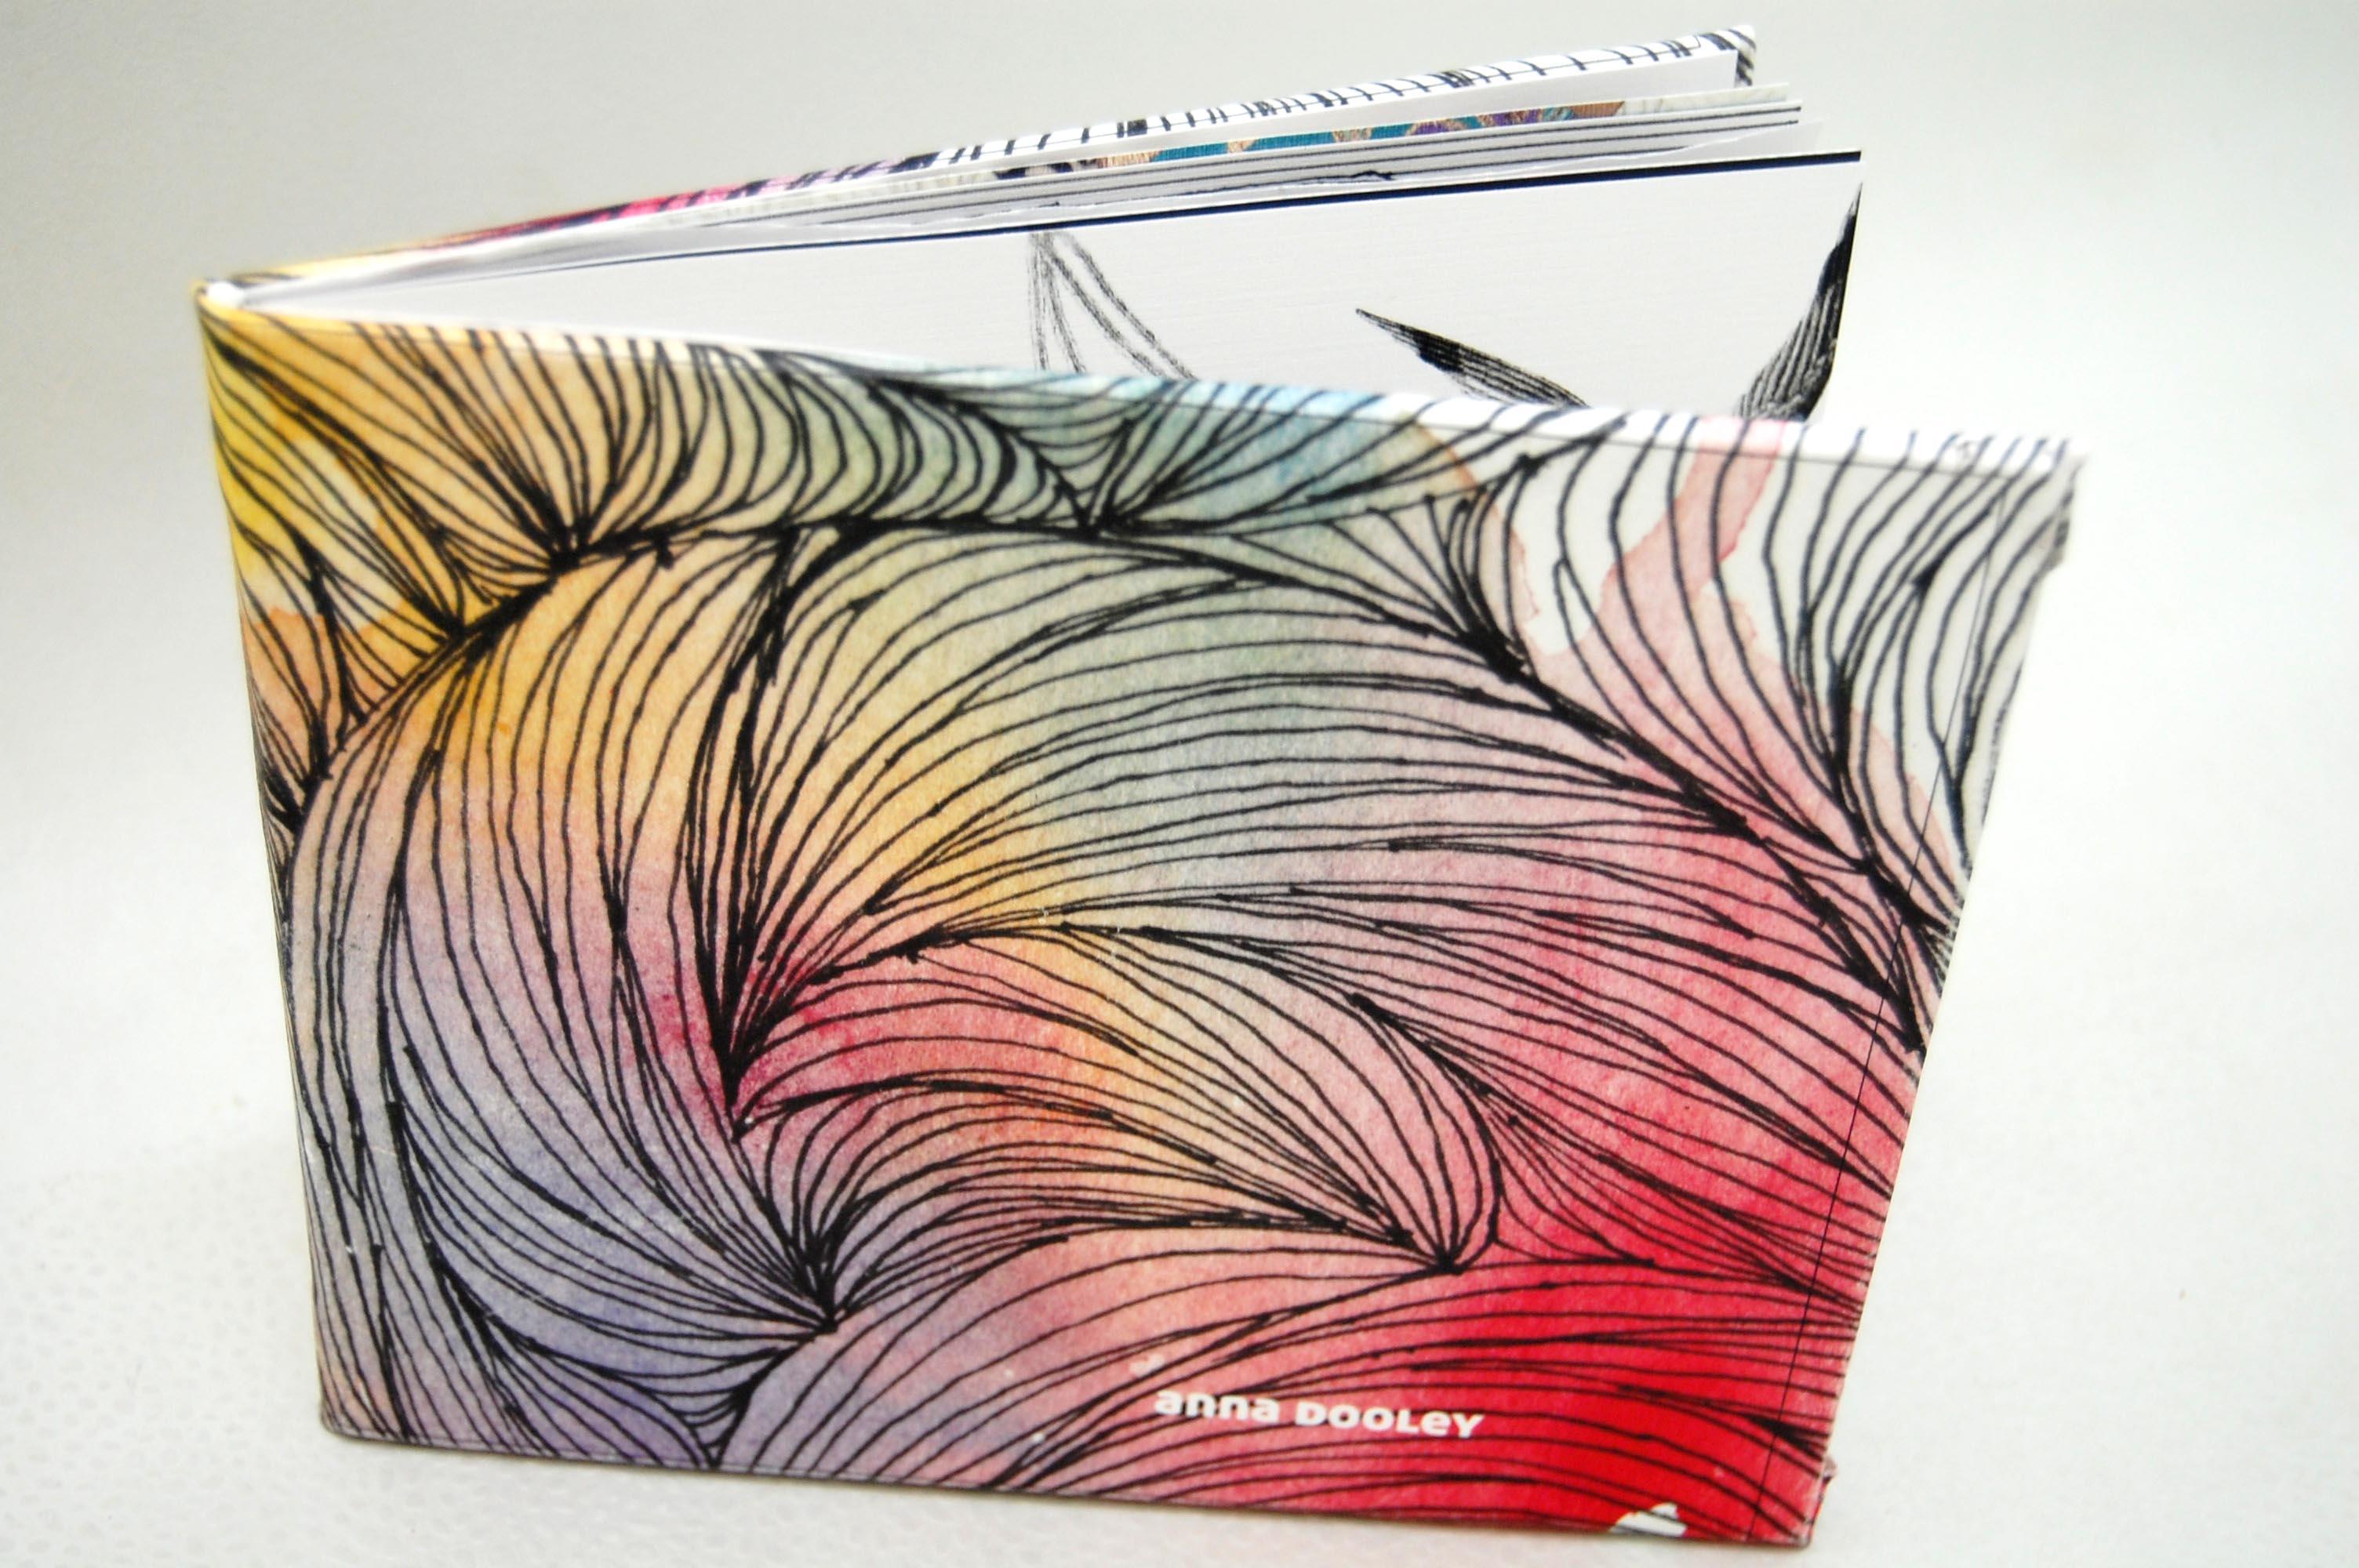 Creative Sketchbook Covers ~ Creative sketchbook cover ideas imgkid the